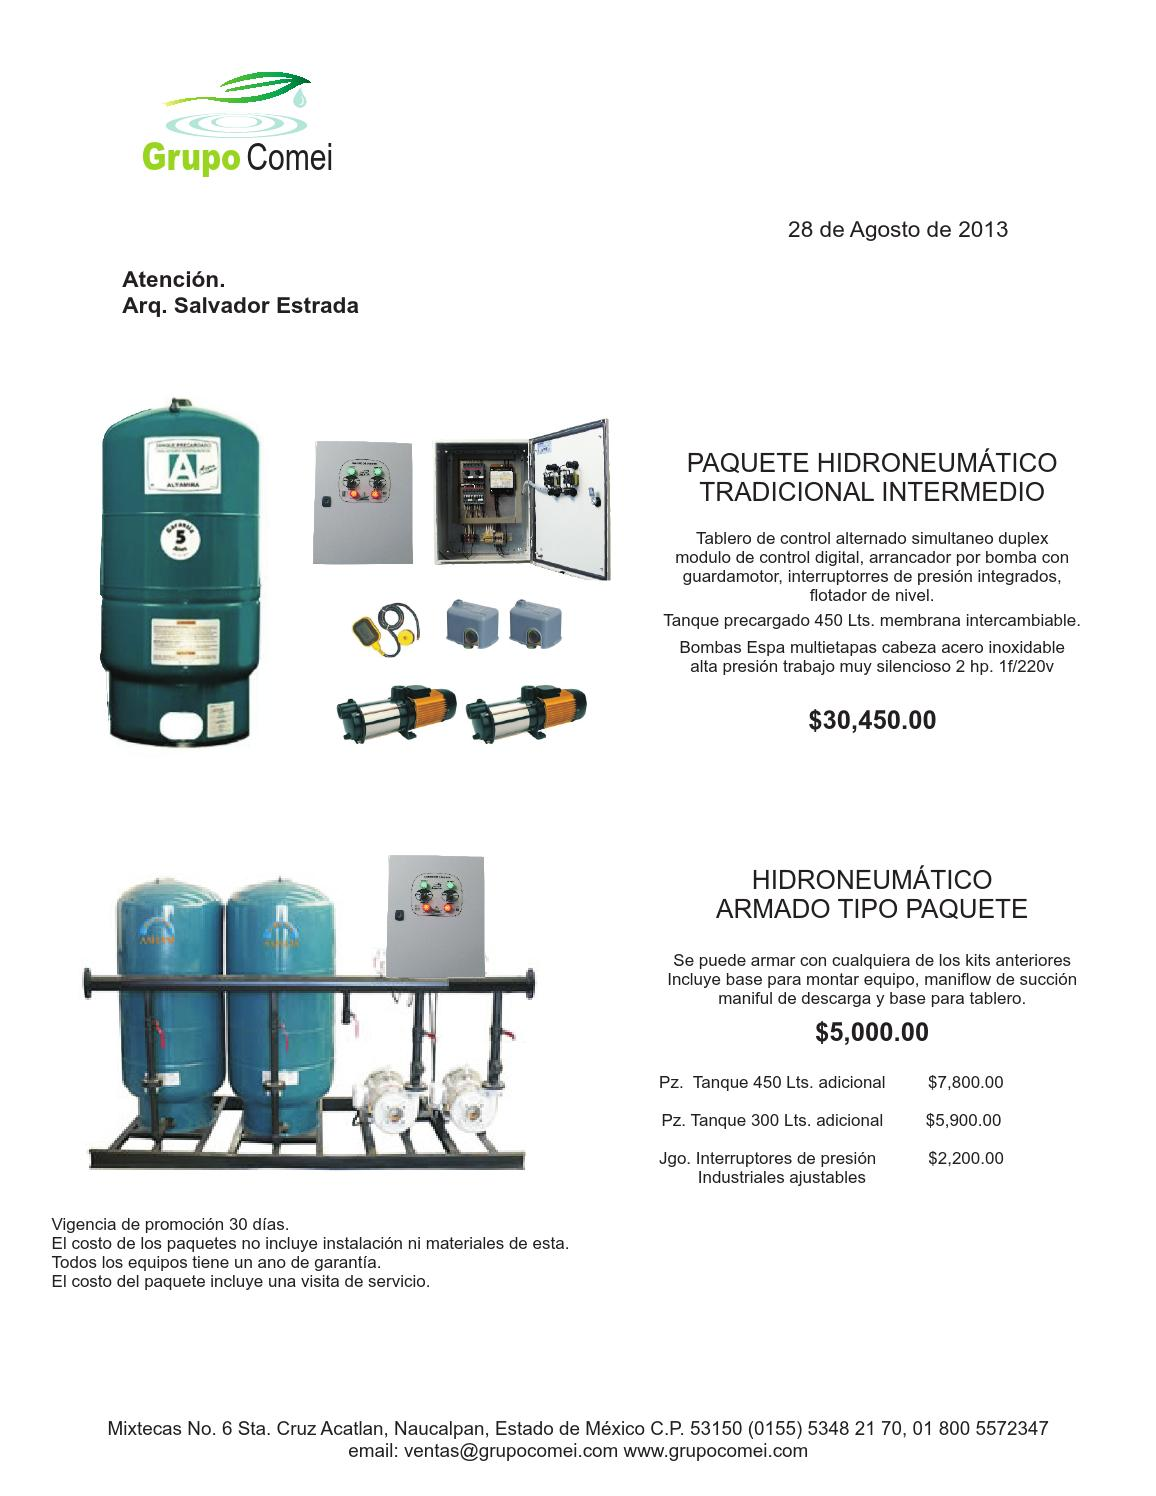 Paquetes duplex hidroneumatico by grupo comei issuu for Costo hidroneumatico